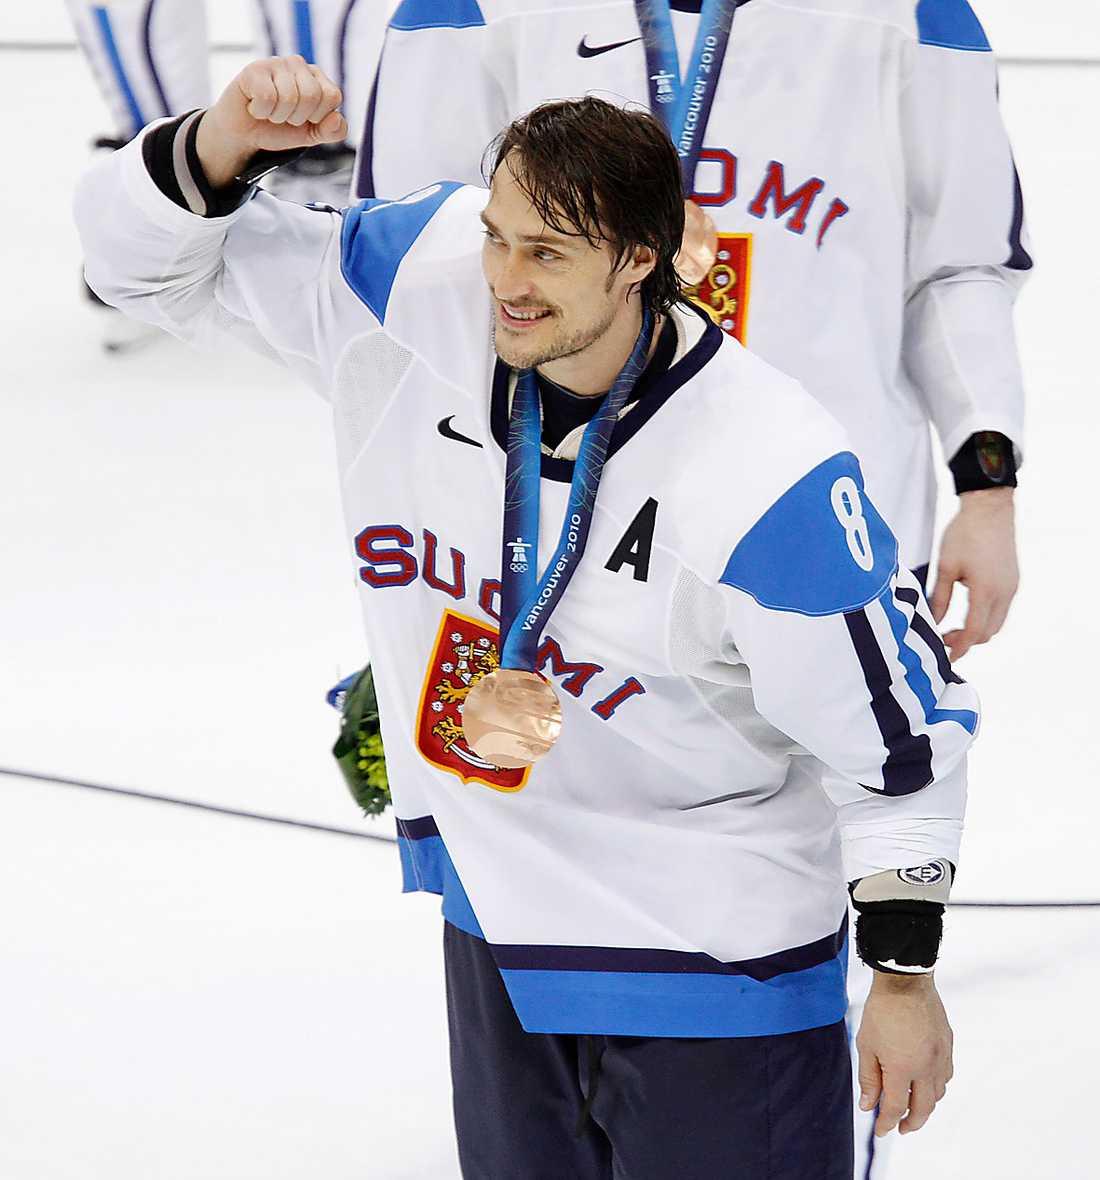 Selänne i OS 2010, VANCOUVER 6 matcher, 0 mål + 2 assist = 2 poäng. Finlands placering: BRONS